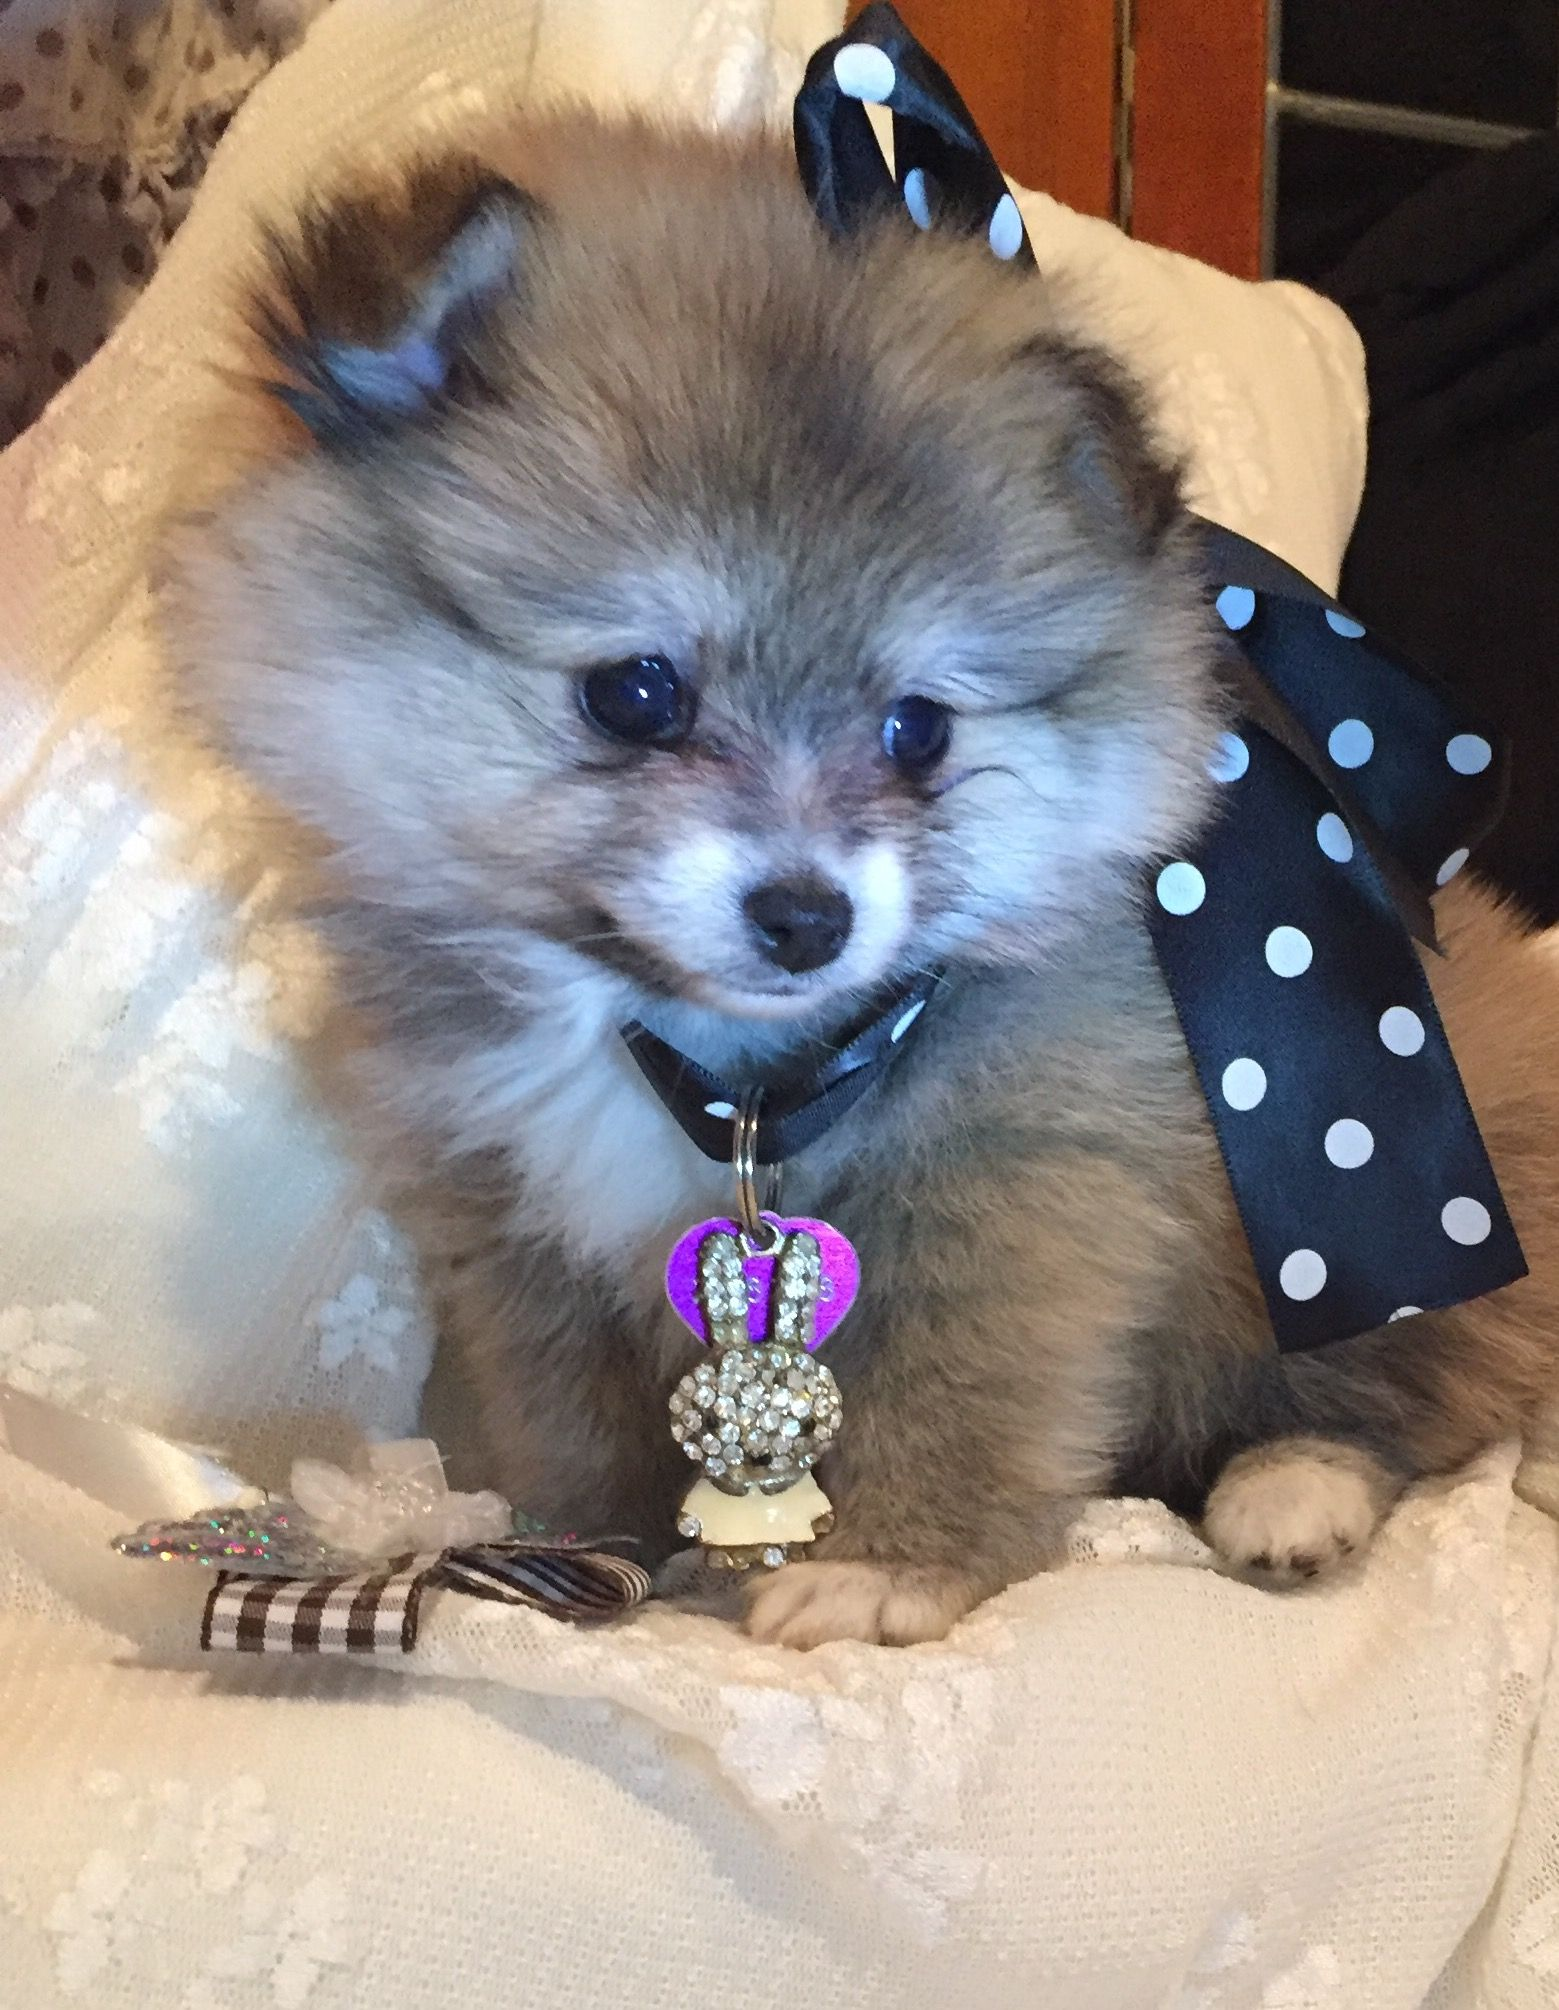 Pin By Judy Barner On Pomeranian Pomeranian Animal Planet Teacup Pomeranian